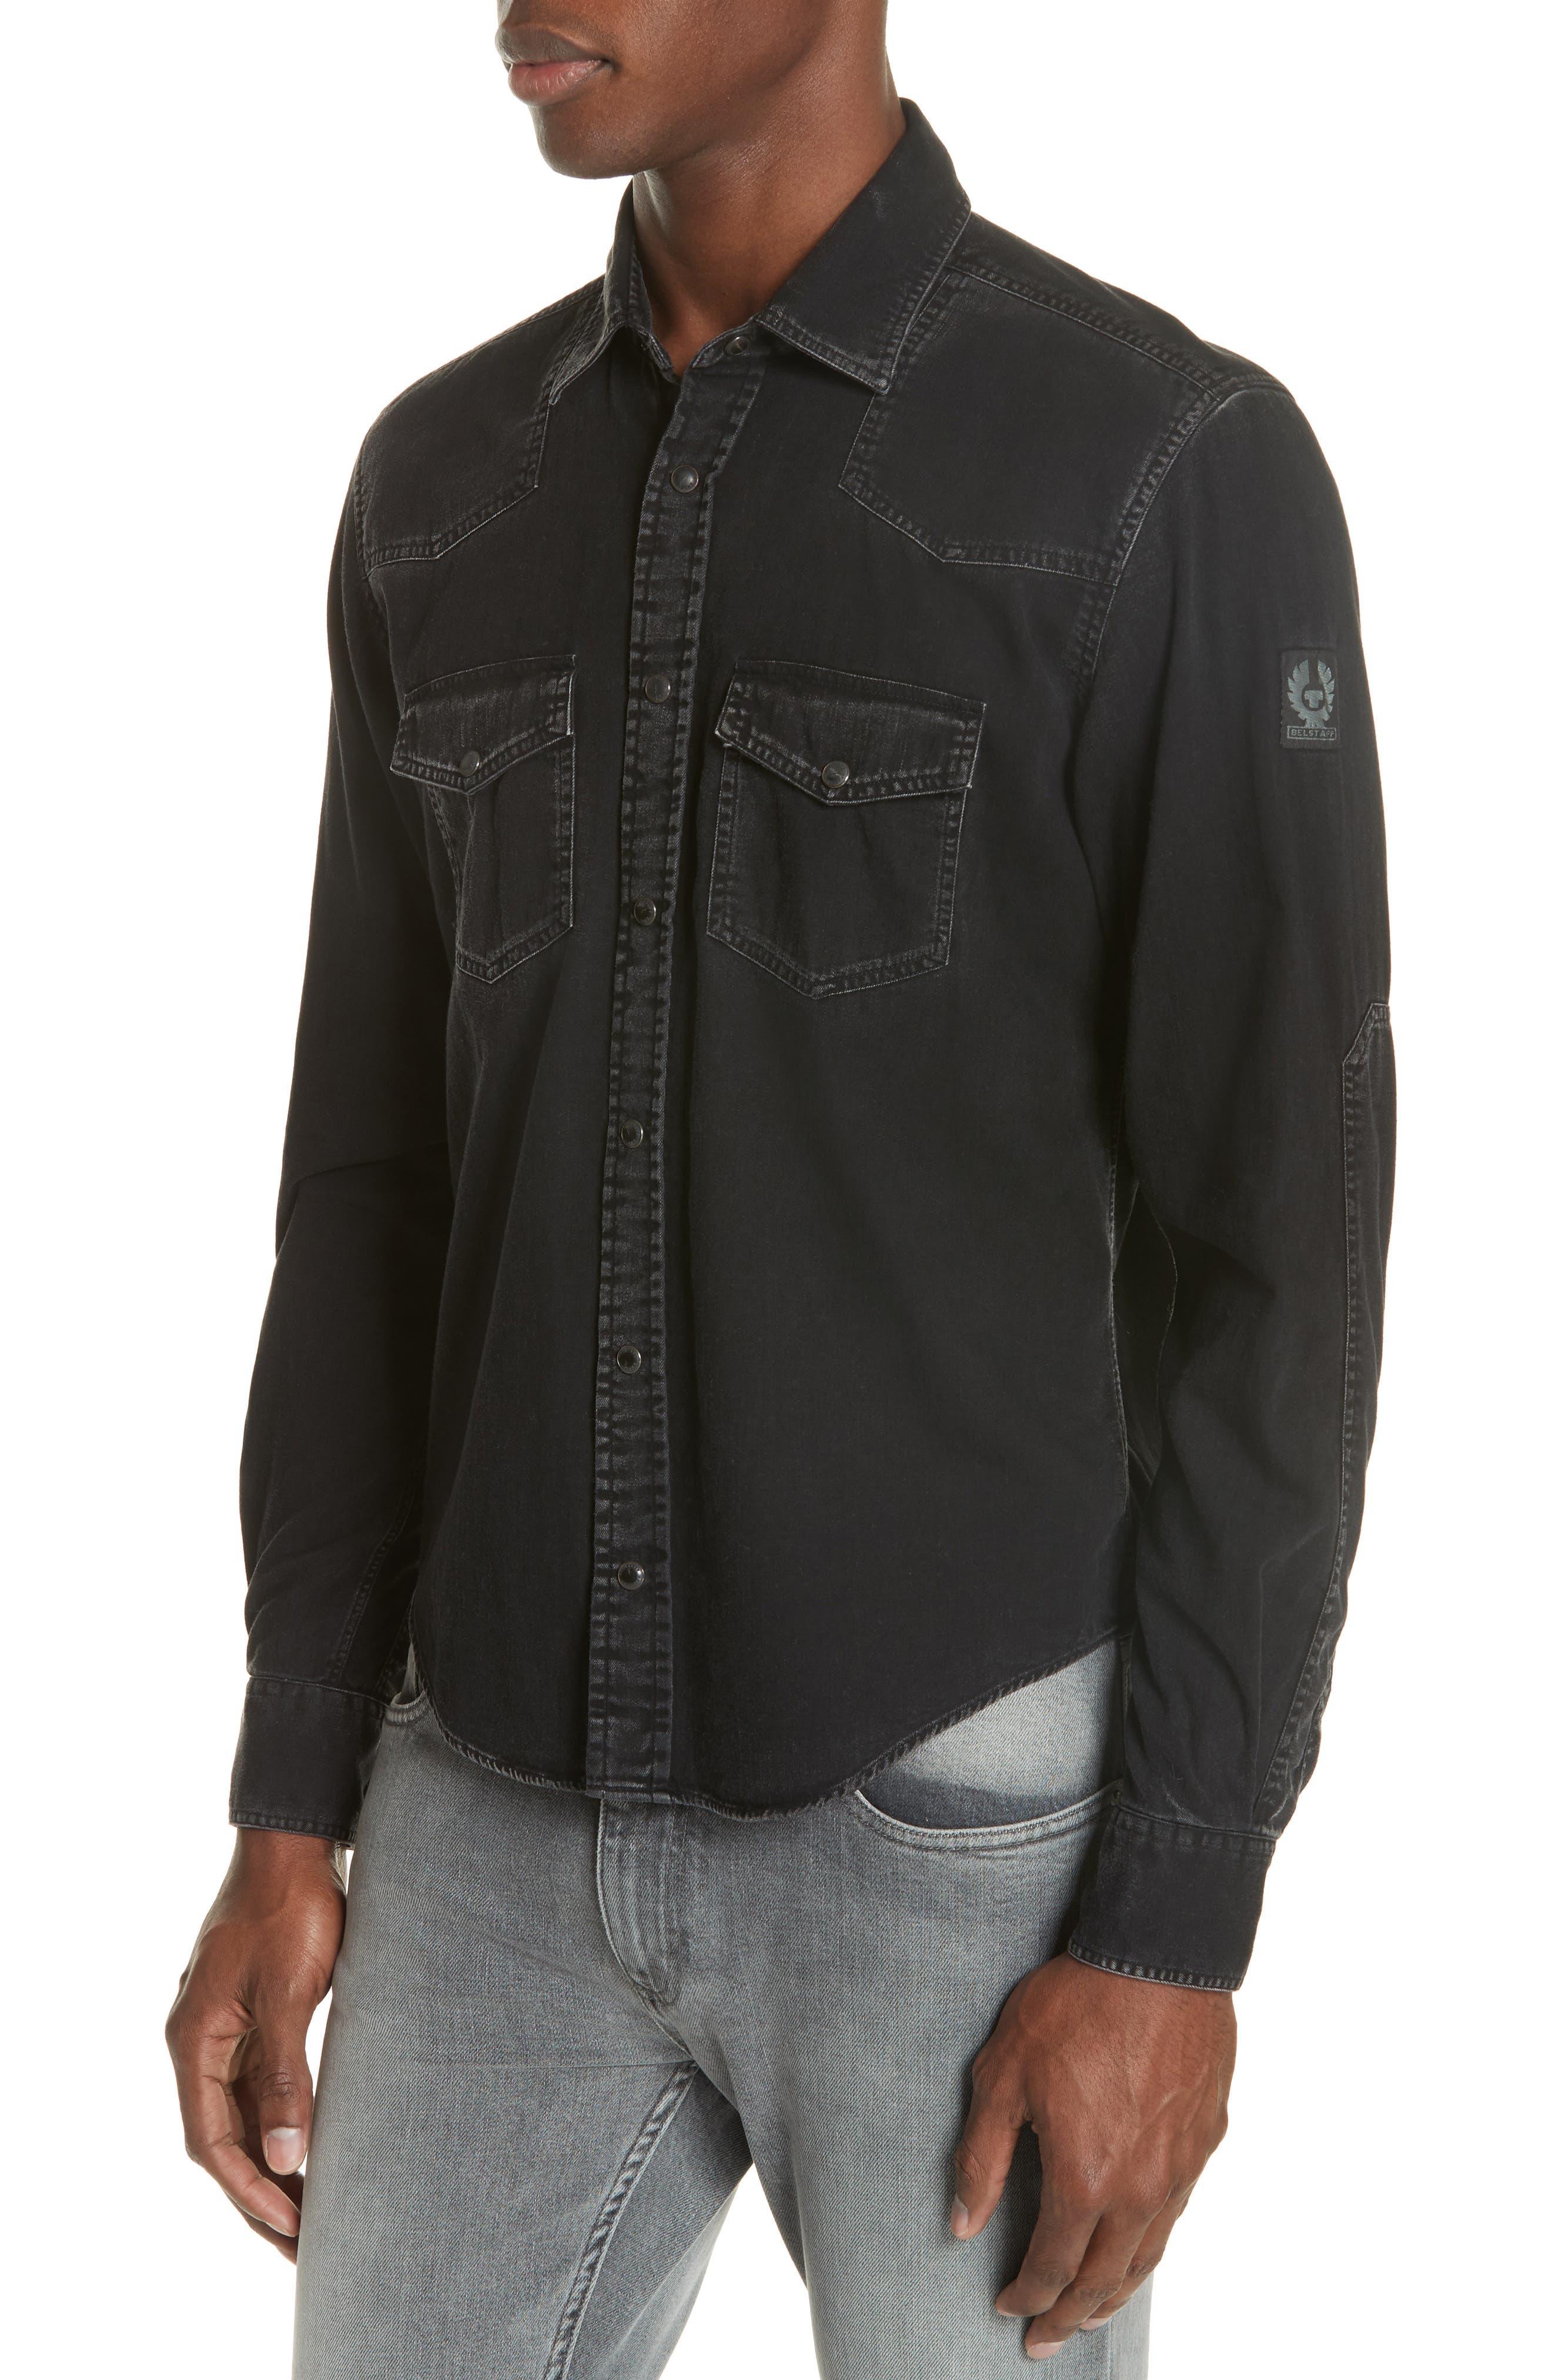 BELSTAFF Somerford Denim Shirt in Black